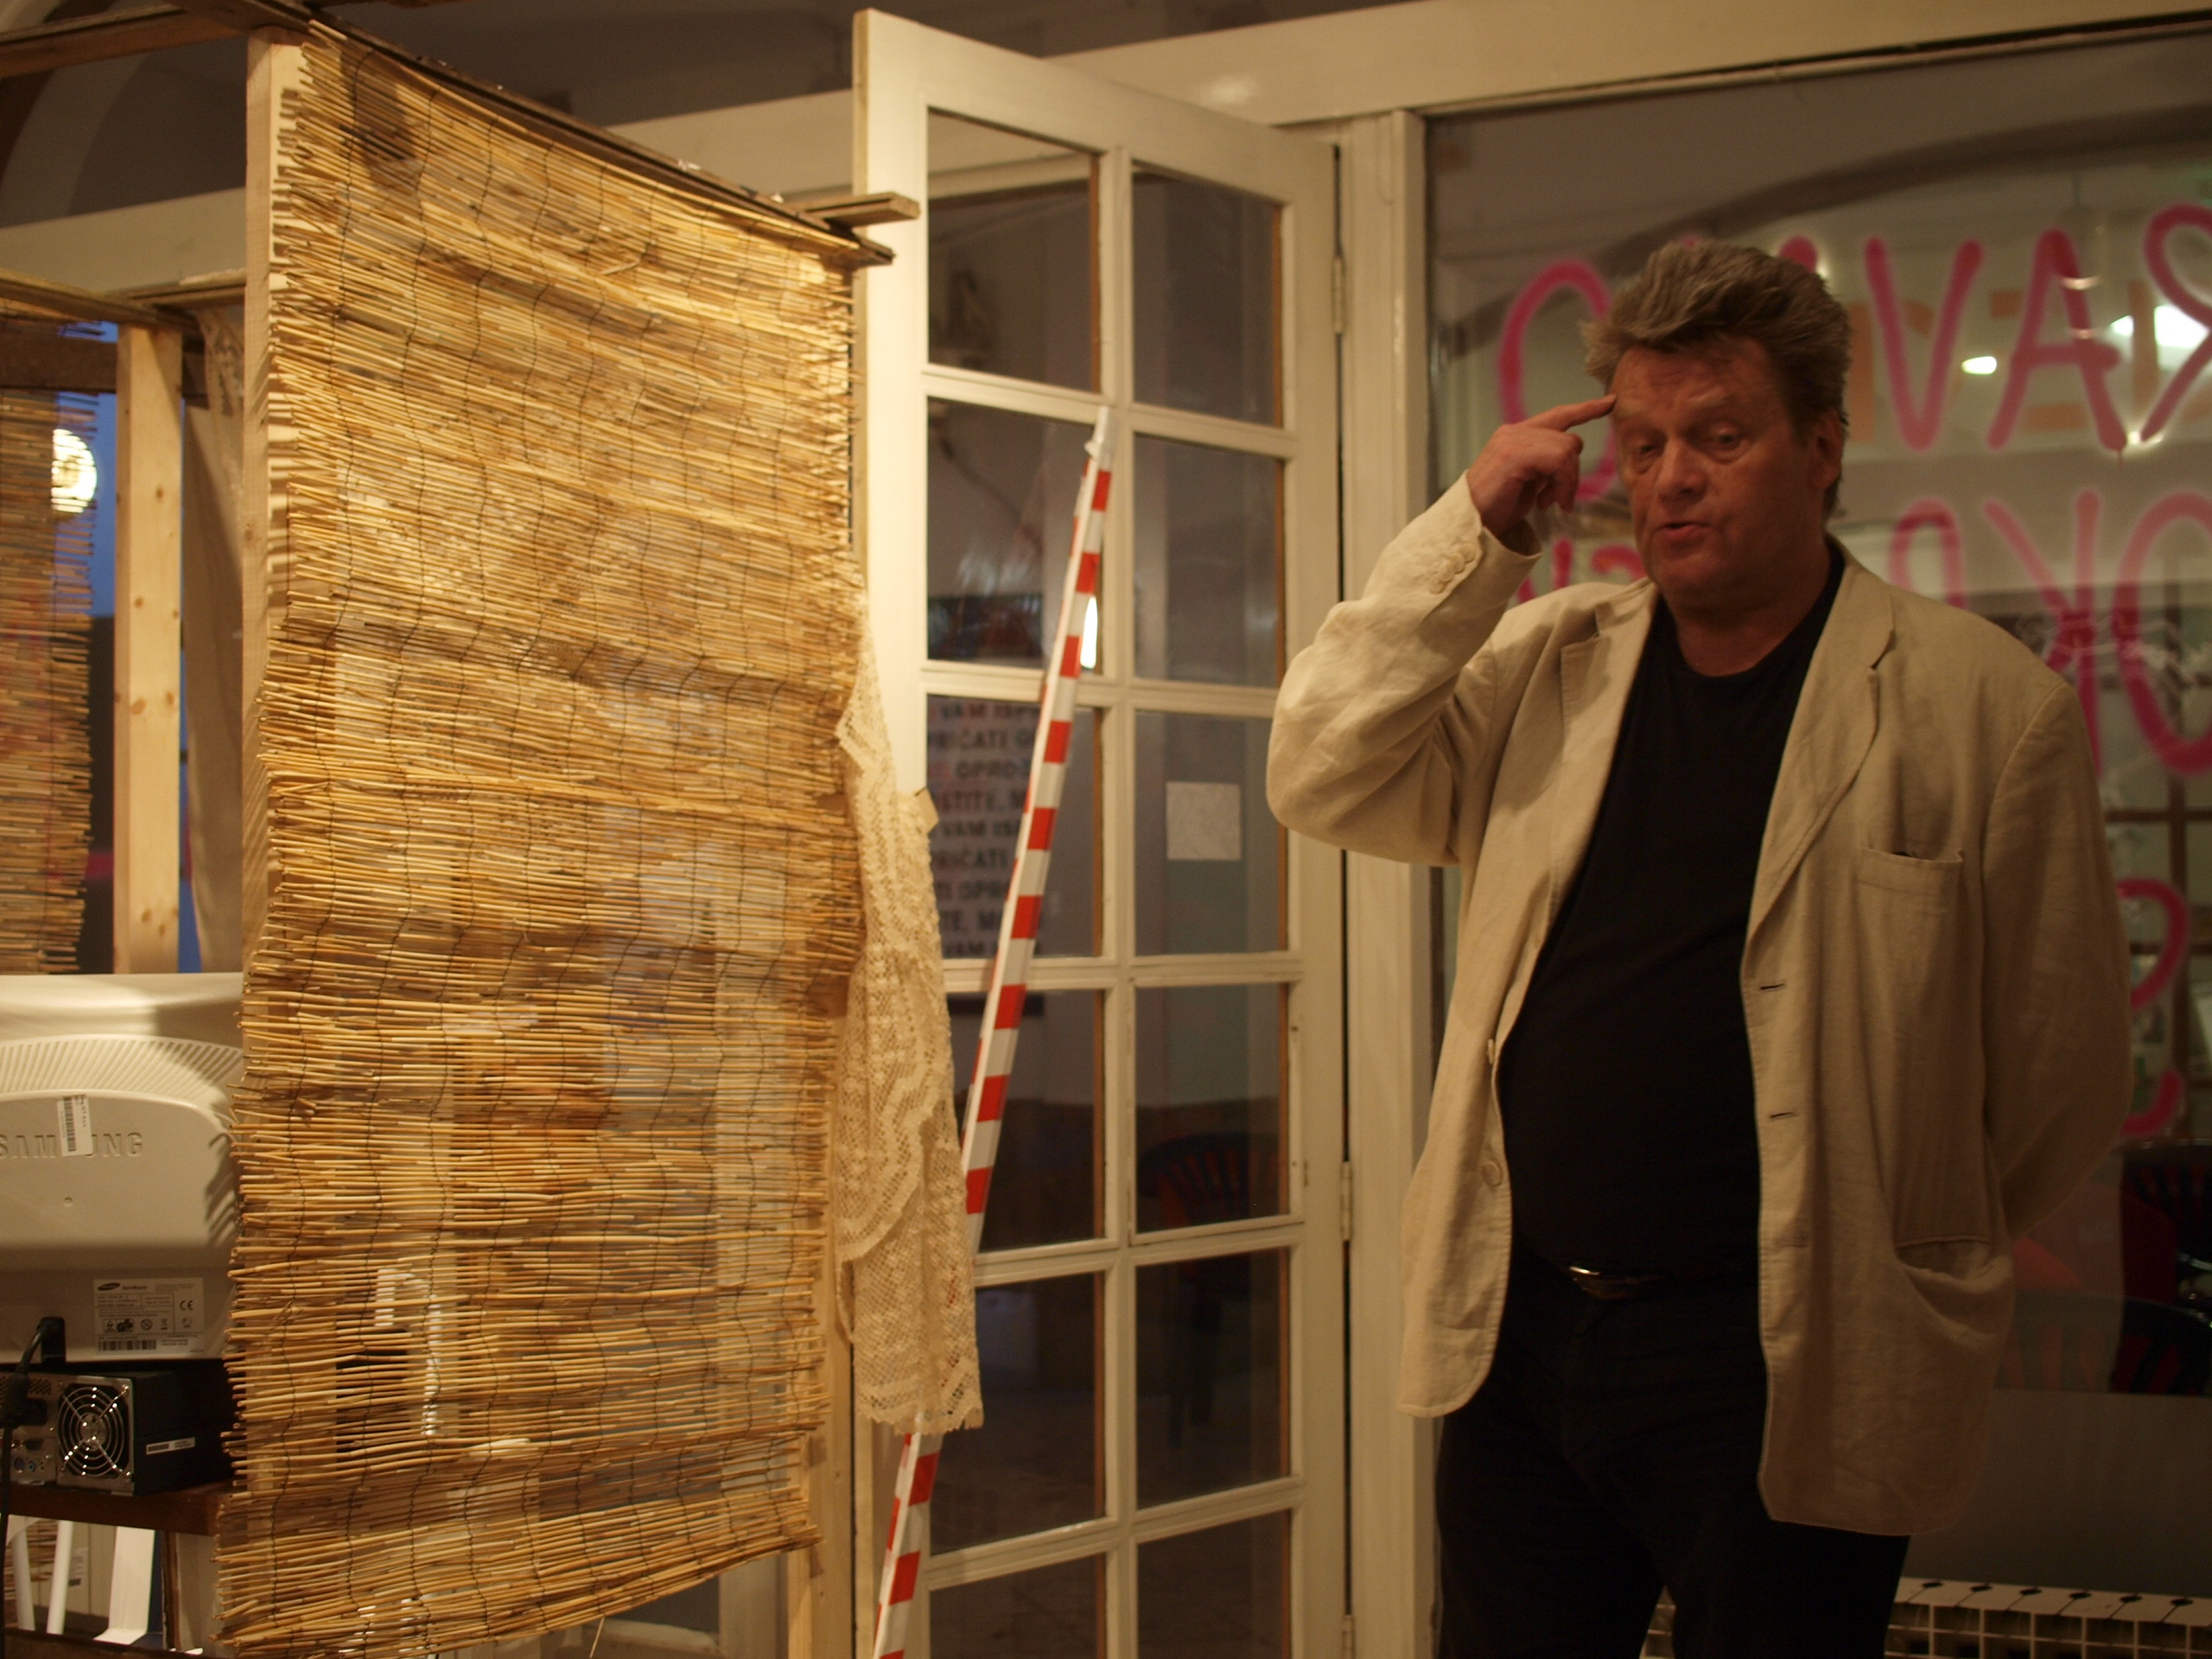 Tamás St.Auby at Galerija Nova, Istanbul Biennal, 2009